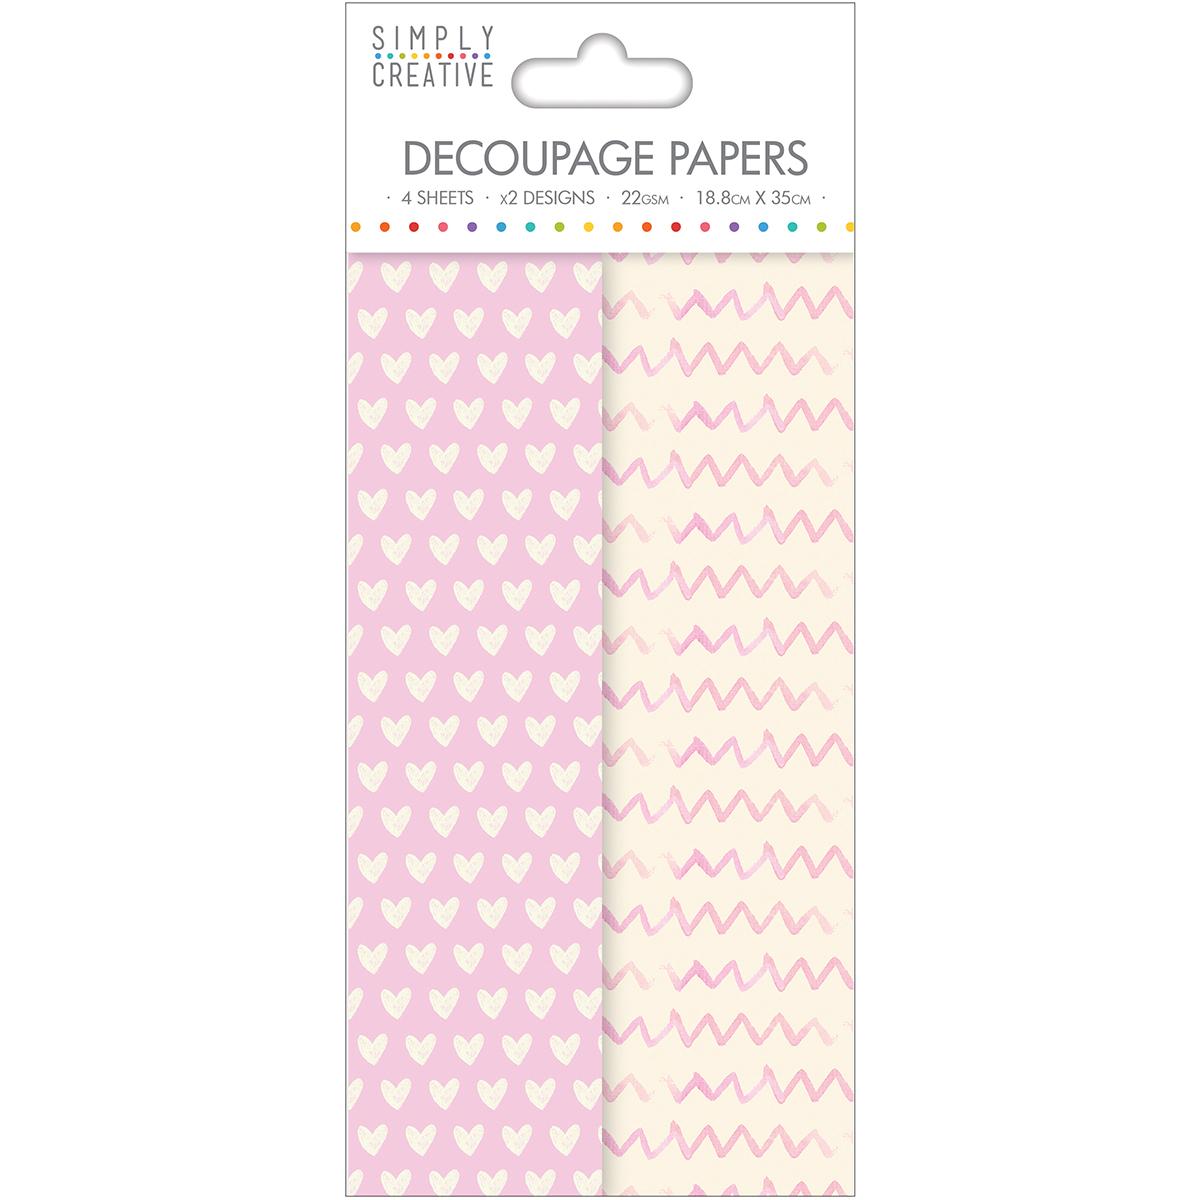 Simply Creative Decoupage Paper 18.8cmX35cm 4/Pkg-Soft Hearts